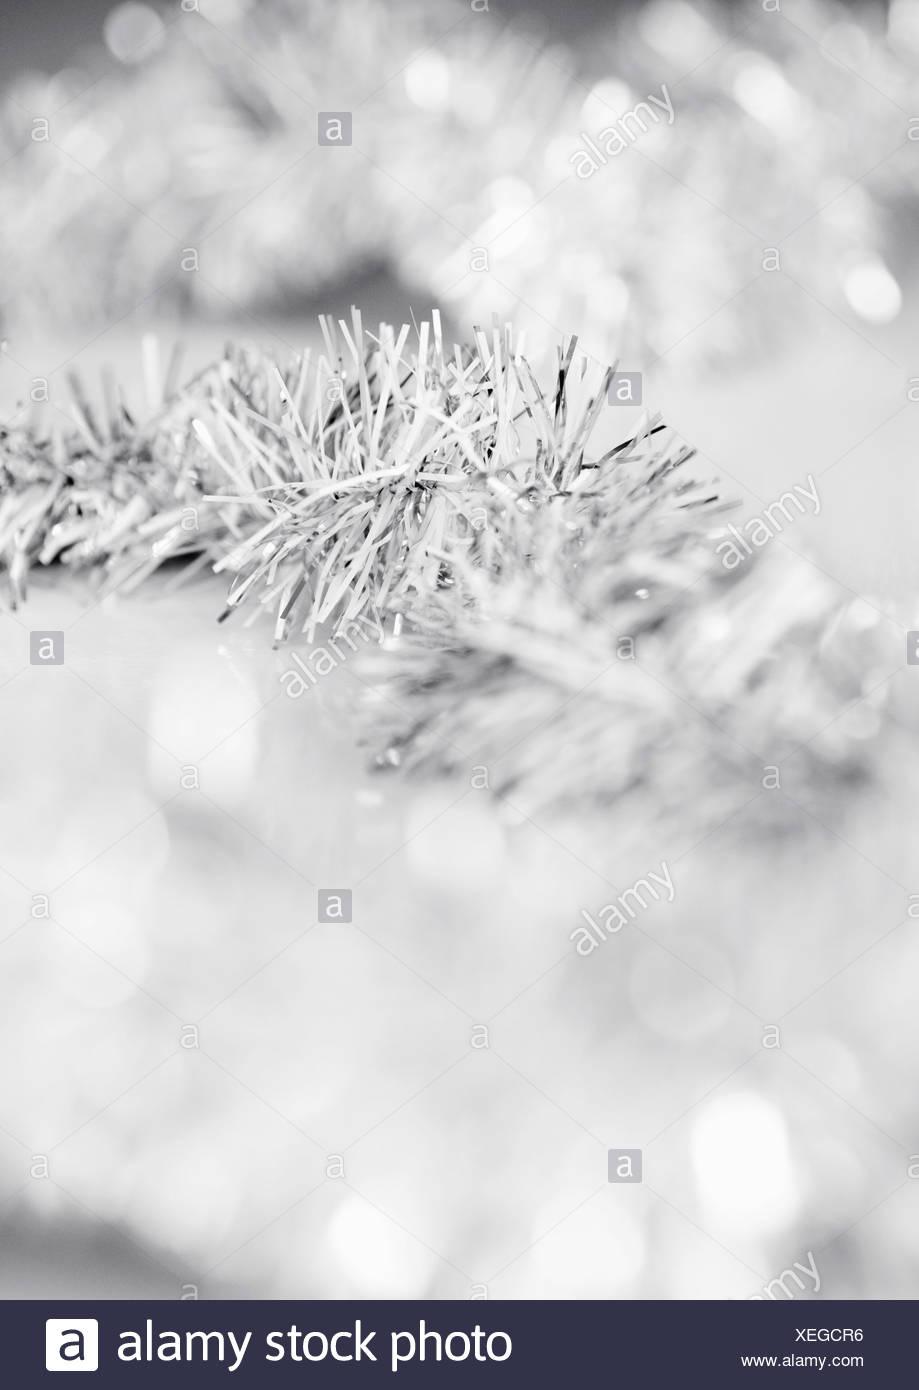 Closeup on Christmas tree tinsel - Stock Image